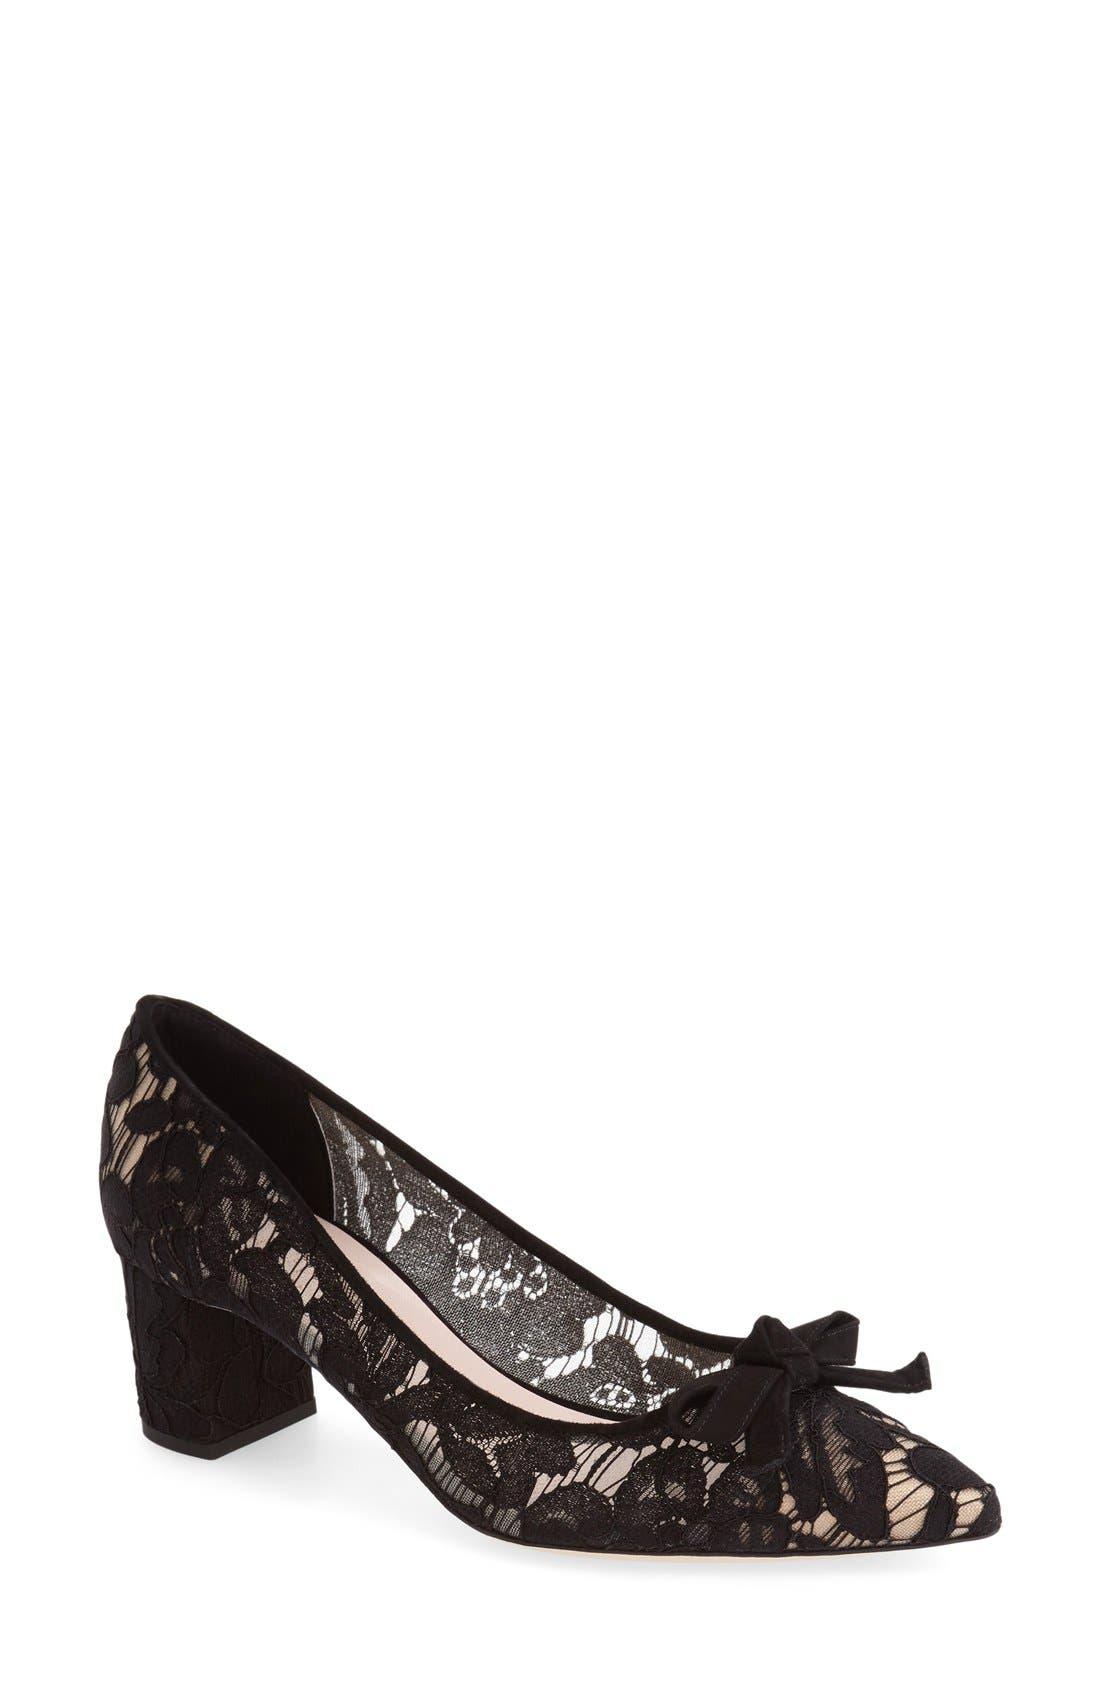 Main Image - kate spade new york 'madelaine' block heel pump (Women)